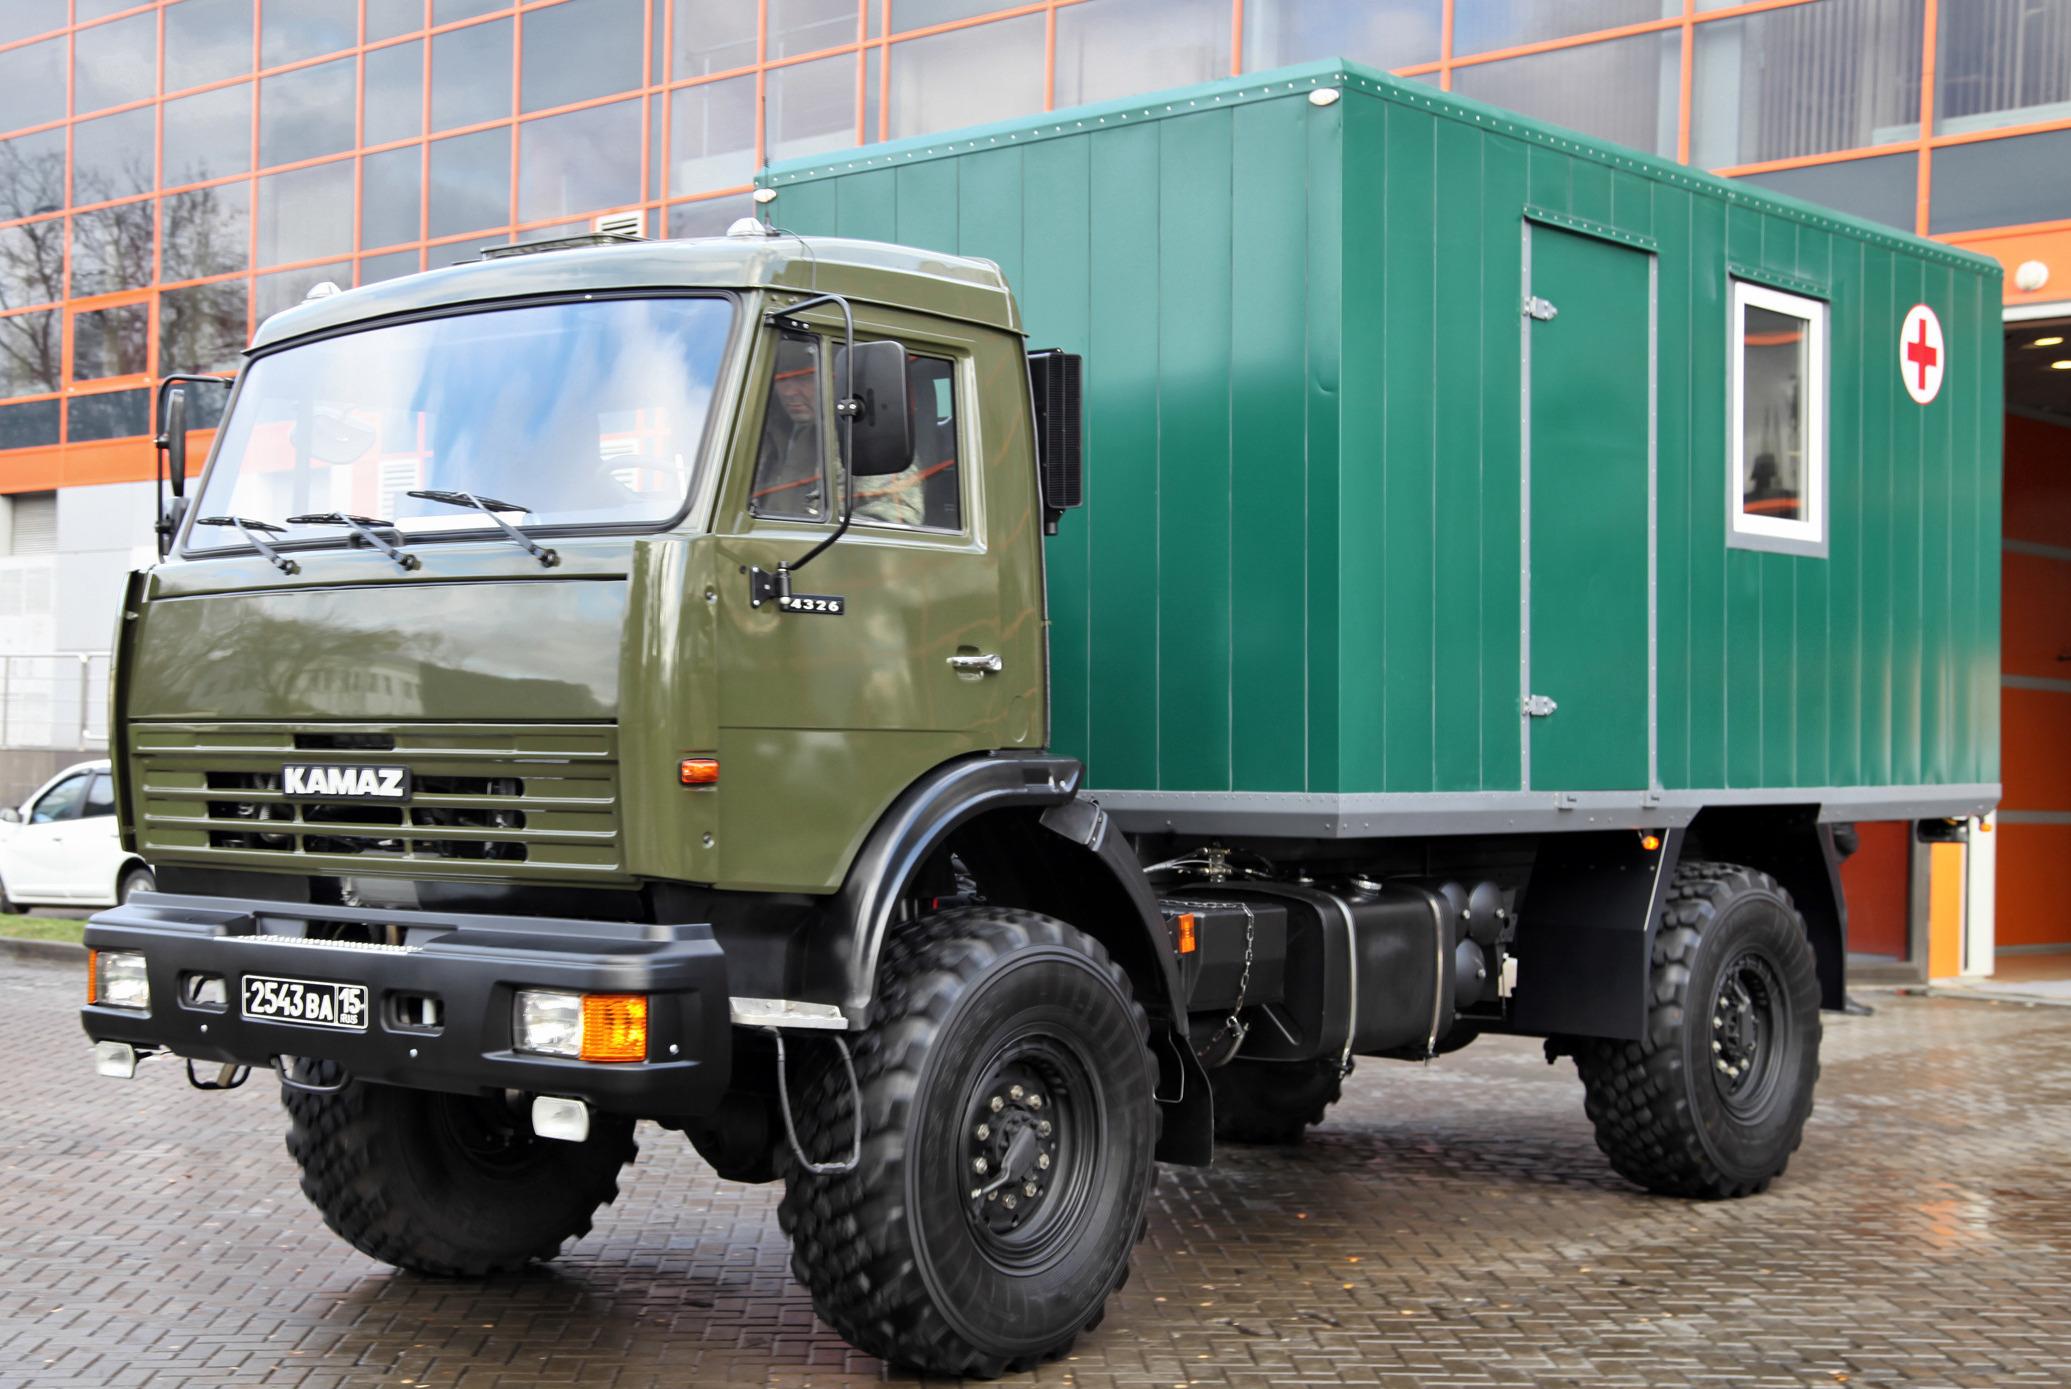 Модификация 2011 года КАМАЗ-4326